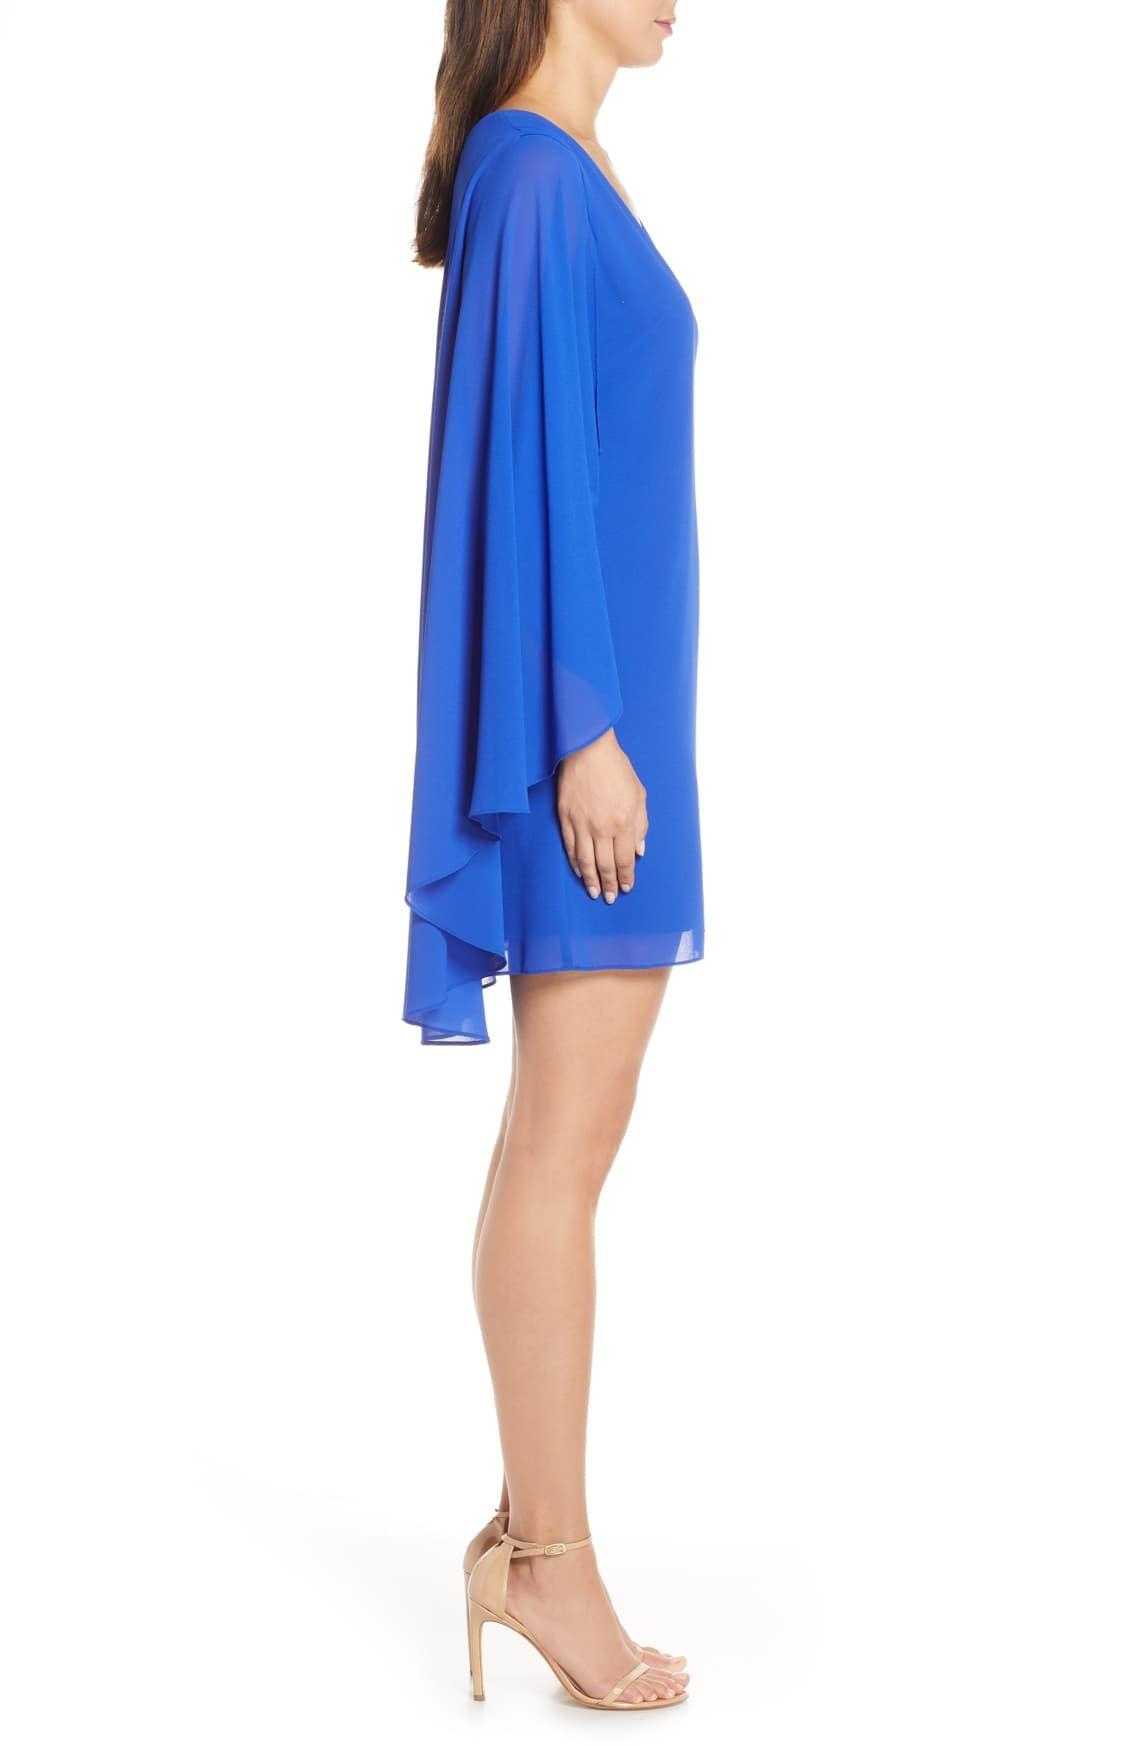 Vince Camuto Cape Back Shift Dress Regular Petite Nordstrom Shift Dress Dresses Fashion [ 1746 x 1140 Pixel ]